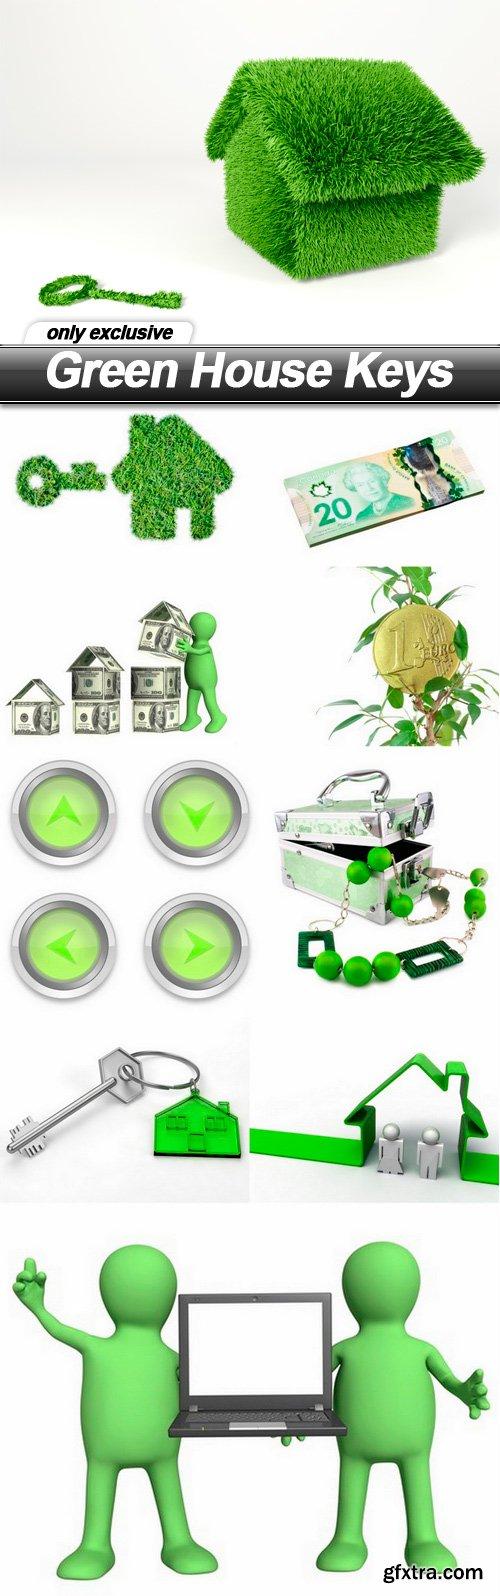 Green House Keys - 10 UHQ JPEG